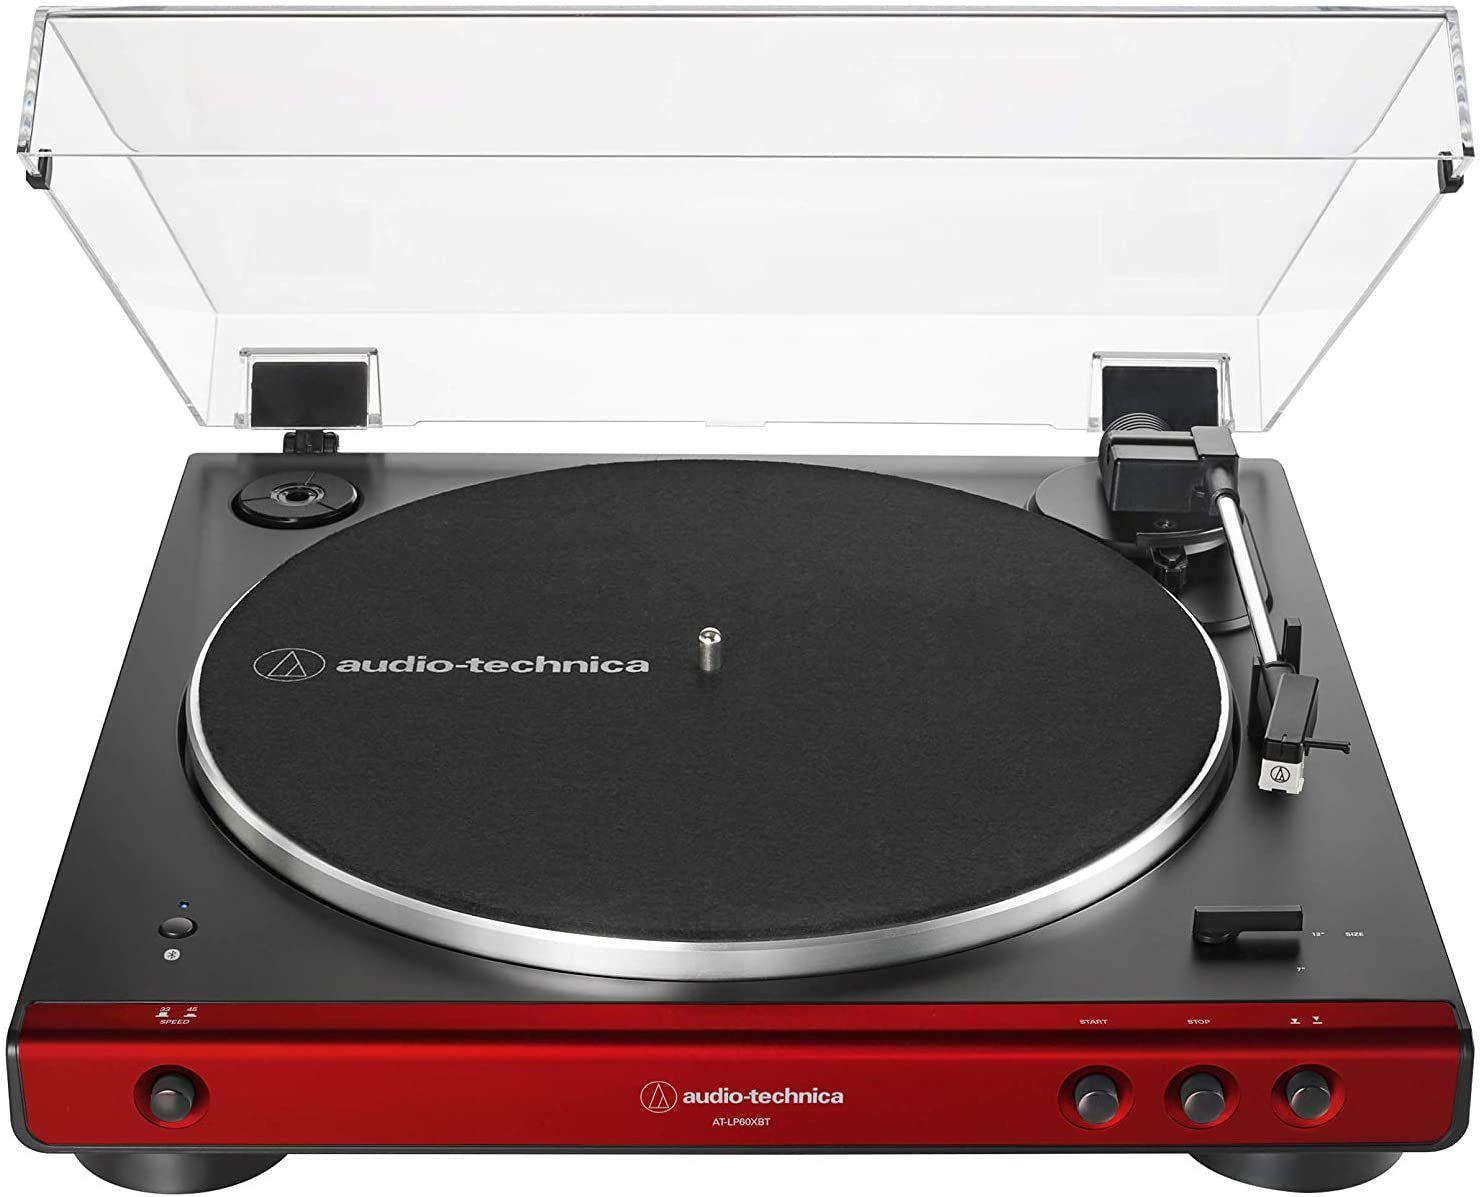 Audio-Technica AT-LP60XBT-RD